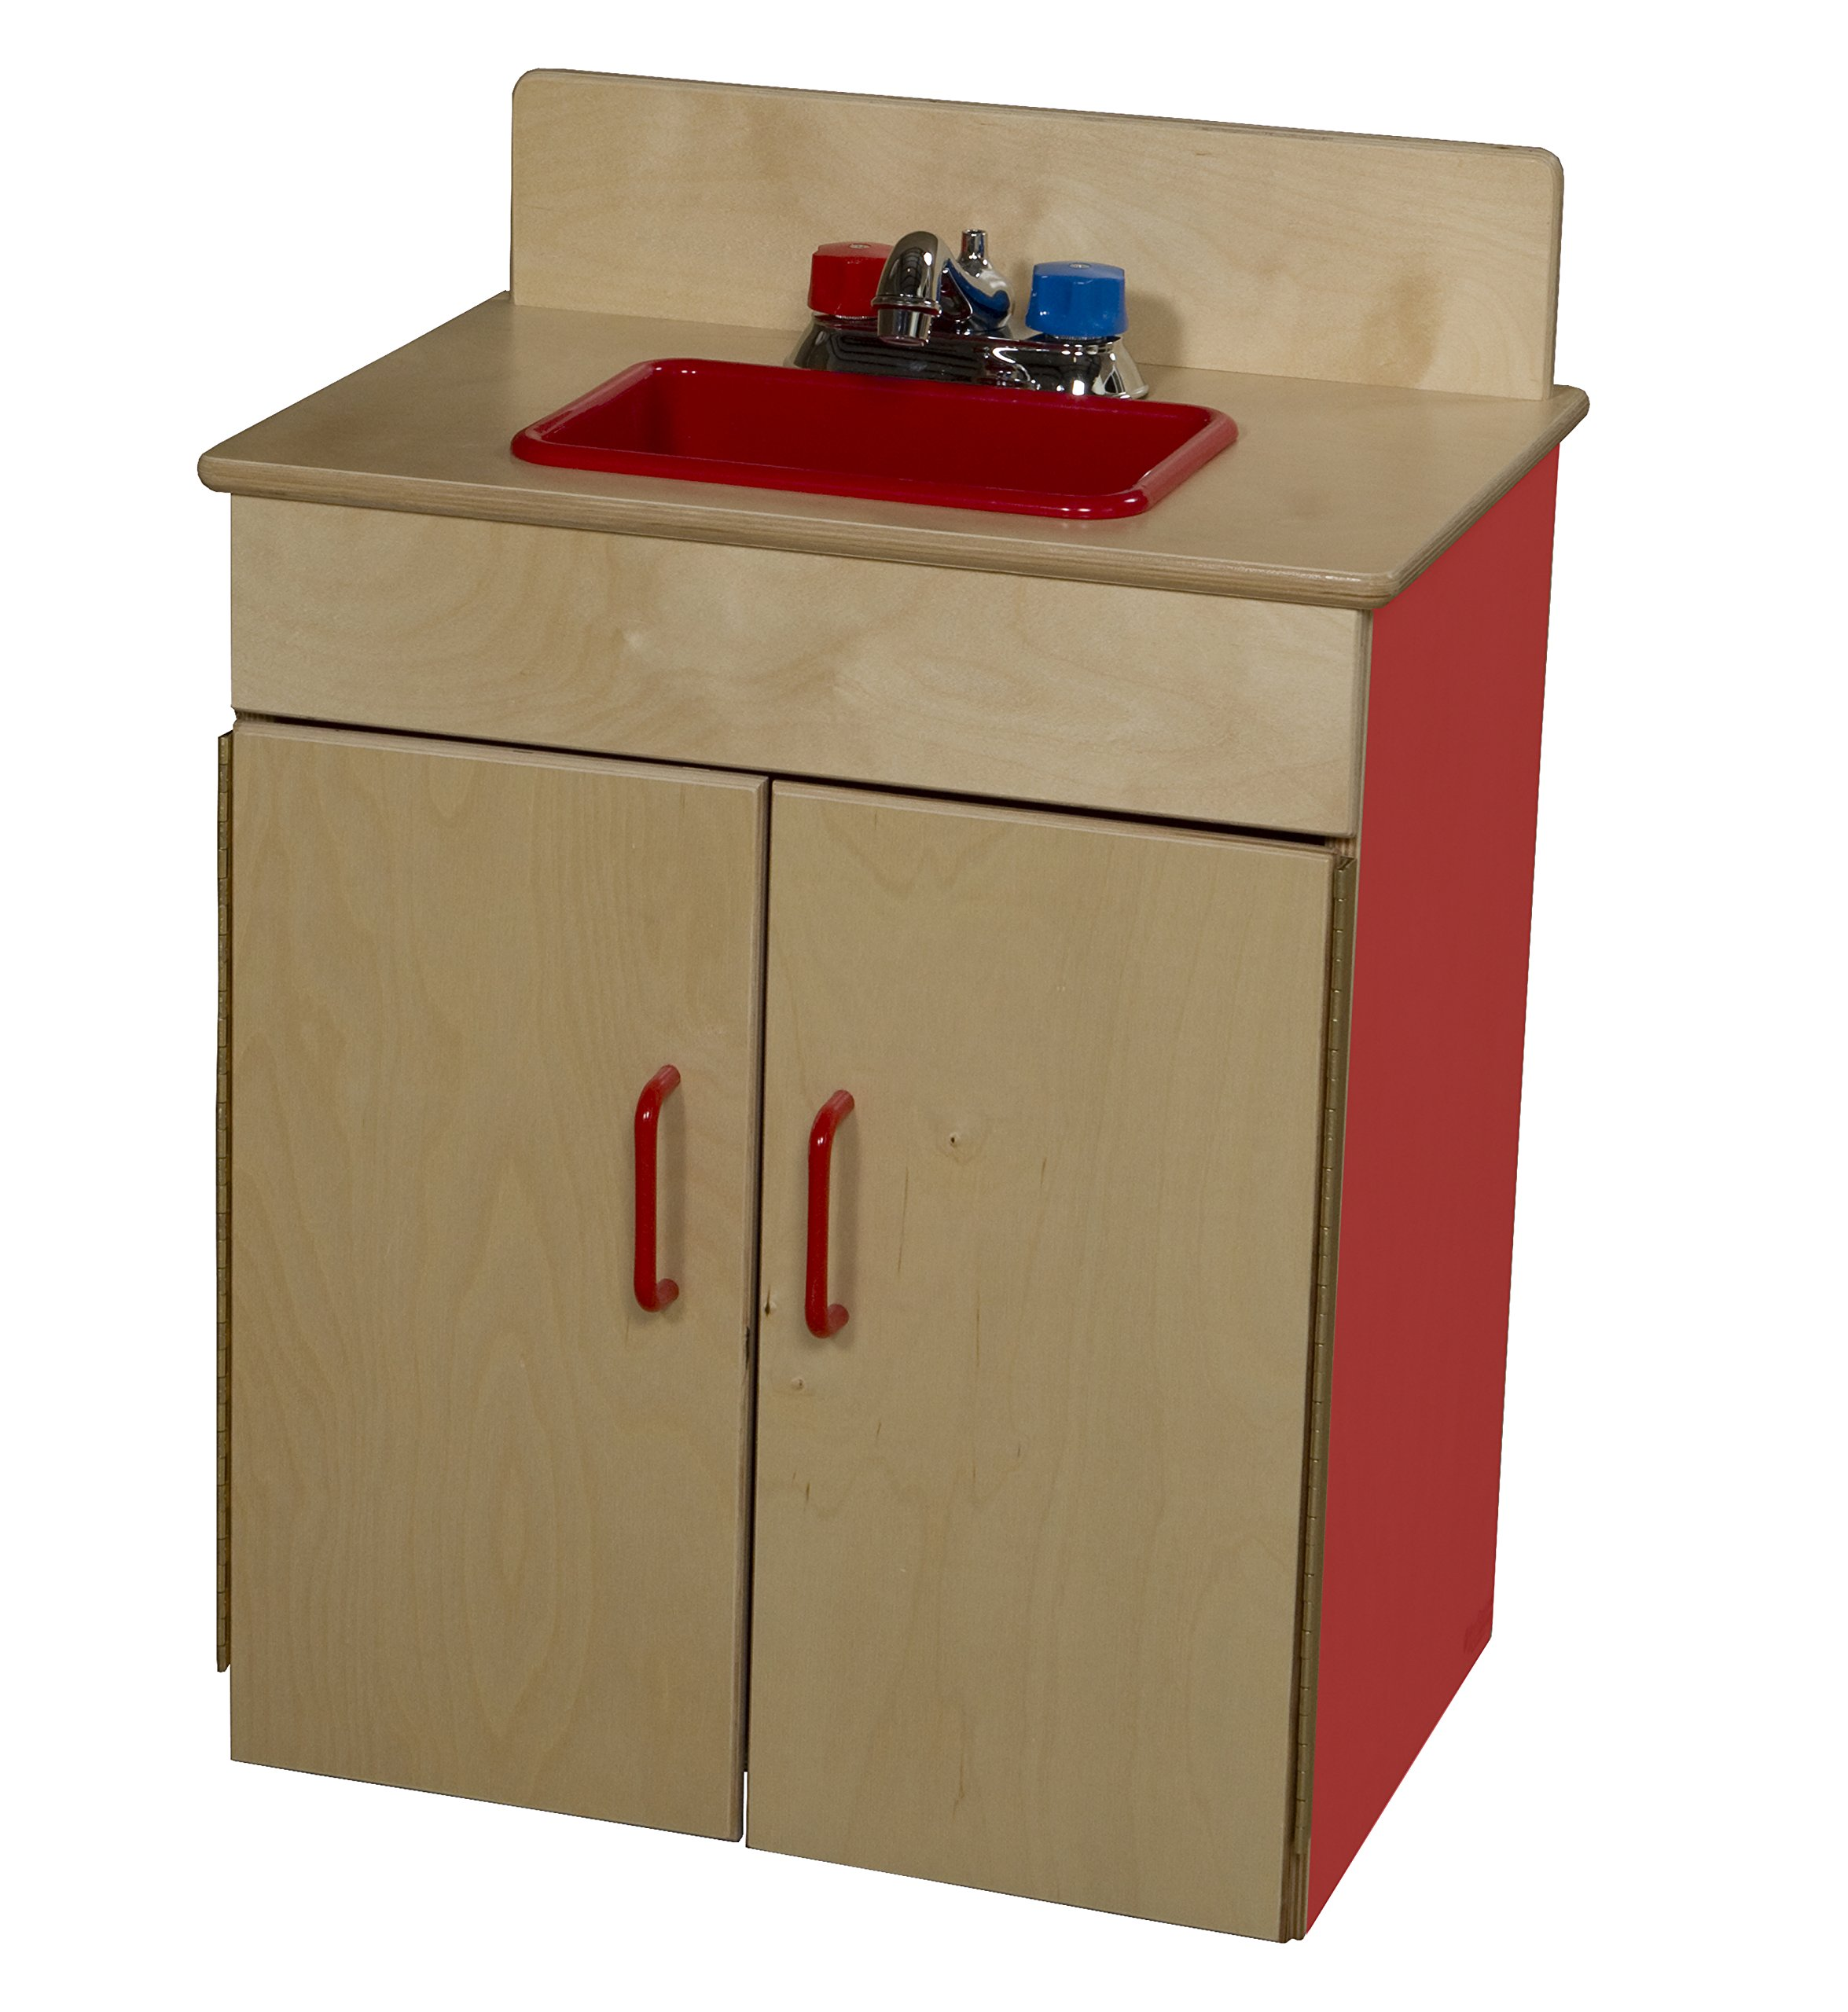 Wood Designs 10200R Strawberry Red Sink